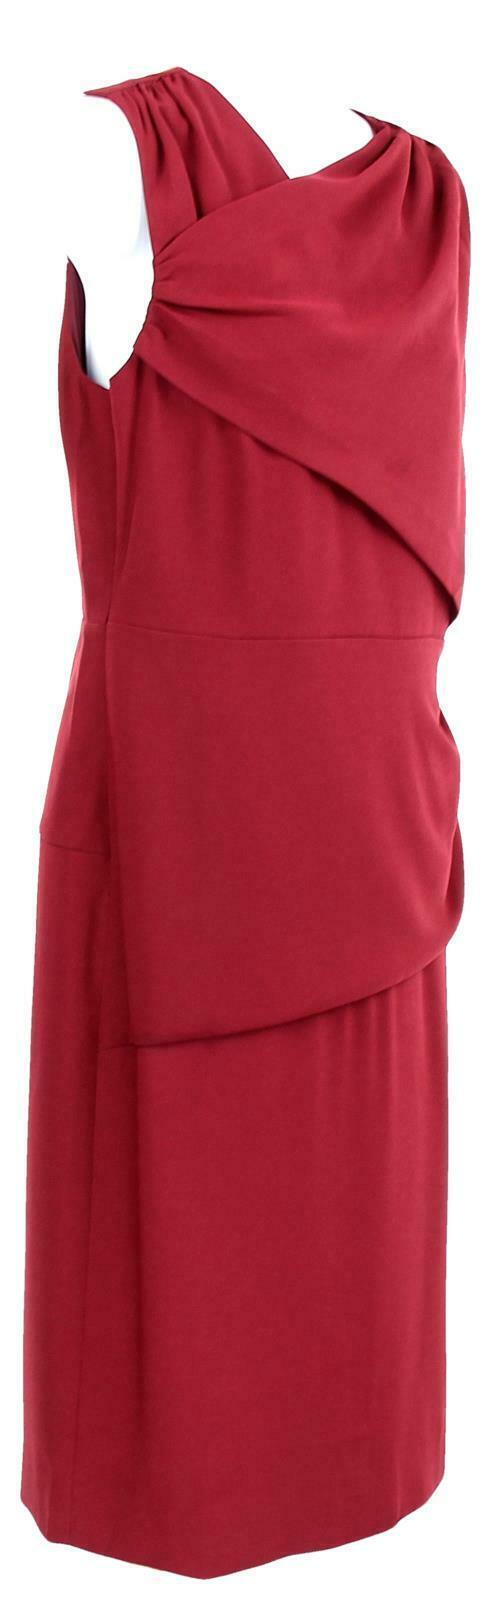 J Crew Women's High Neck Sheath Dress Everyday Lucky Crepe Wear to Work 8 J7452 image 2